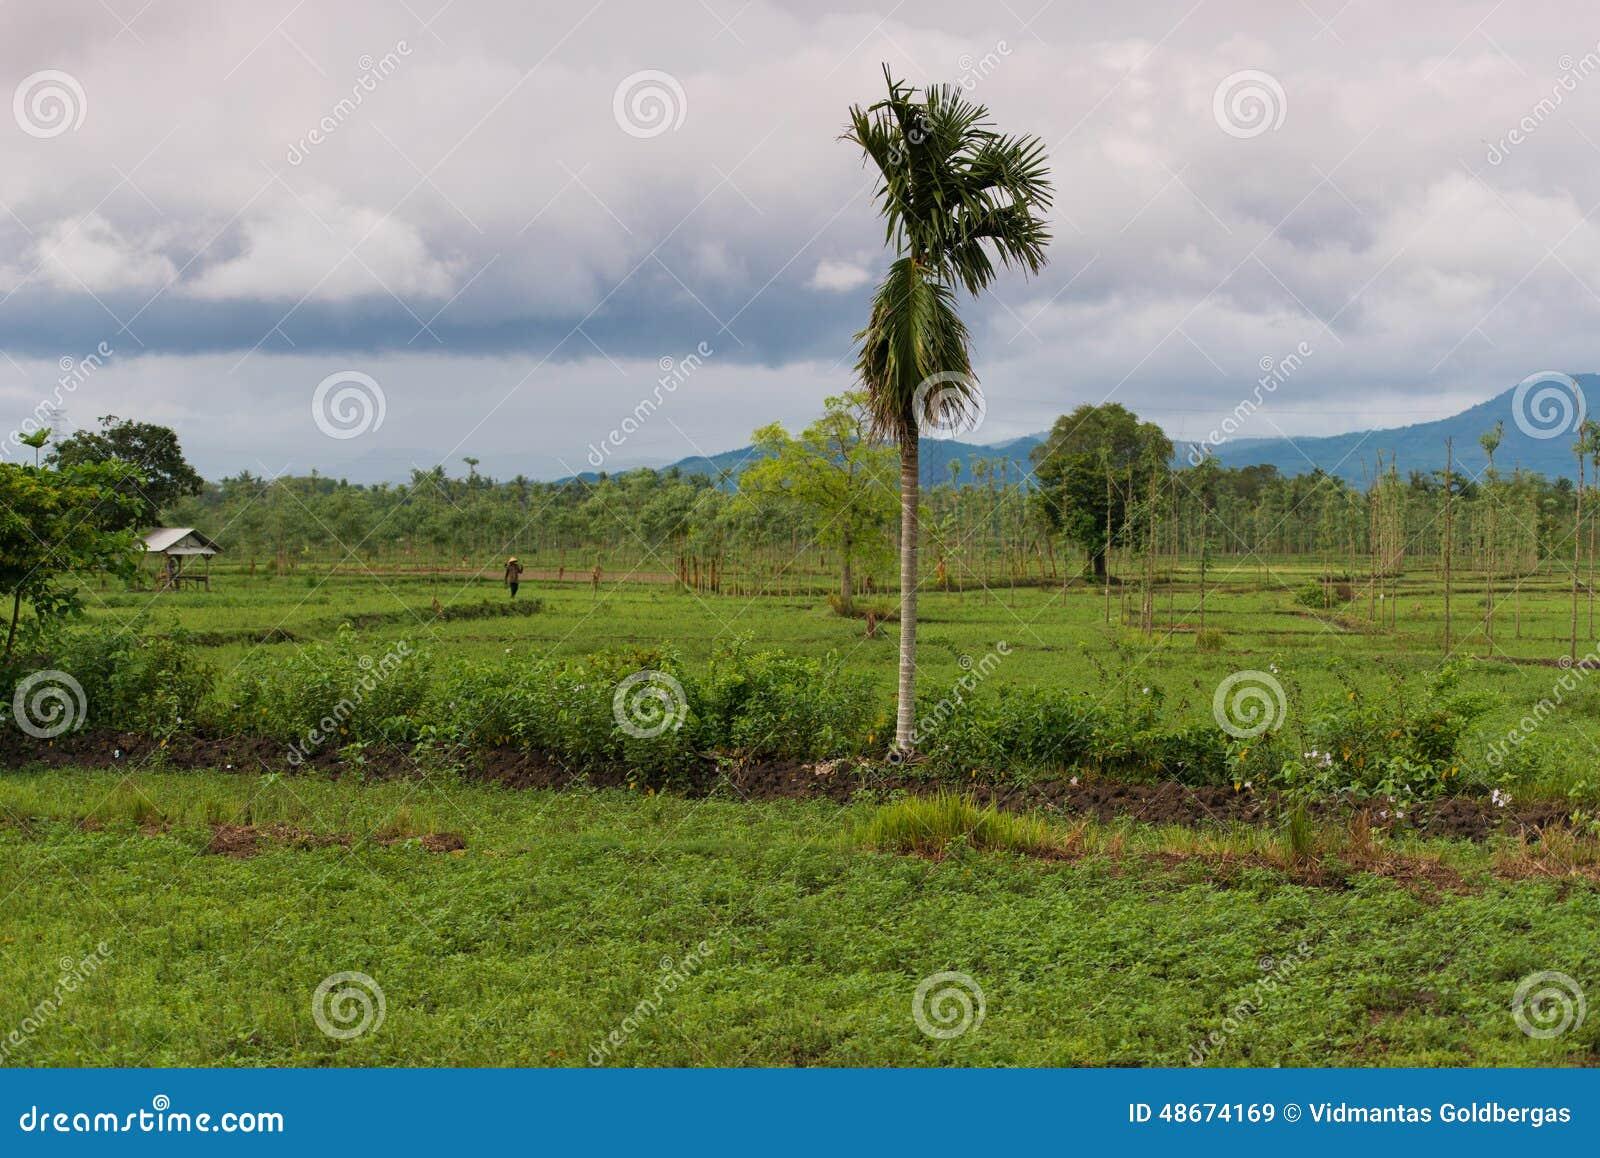 Indonesian nature